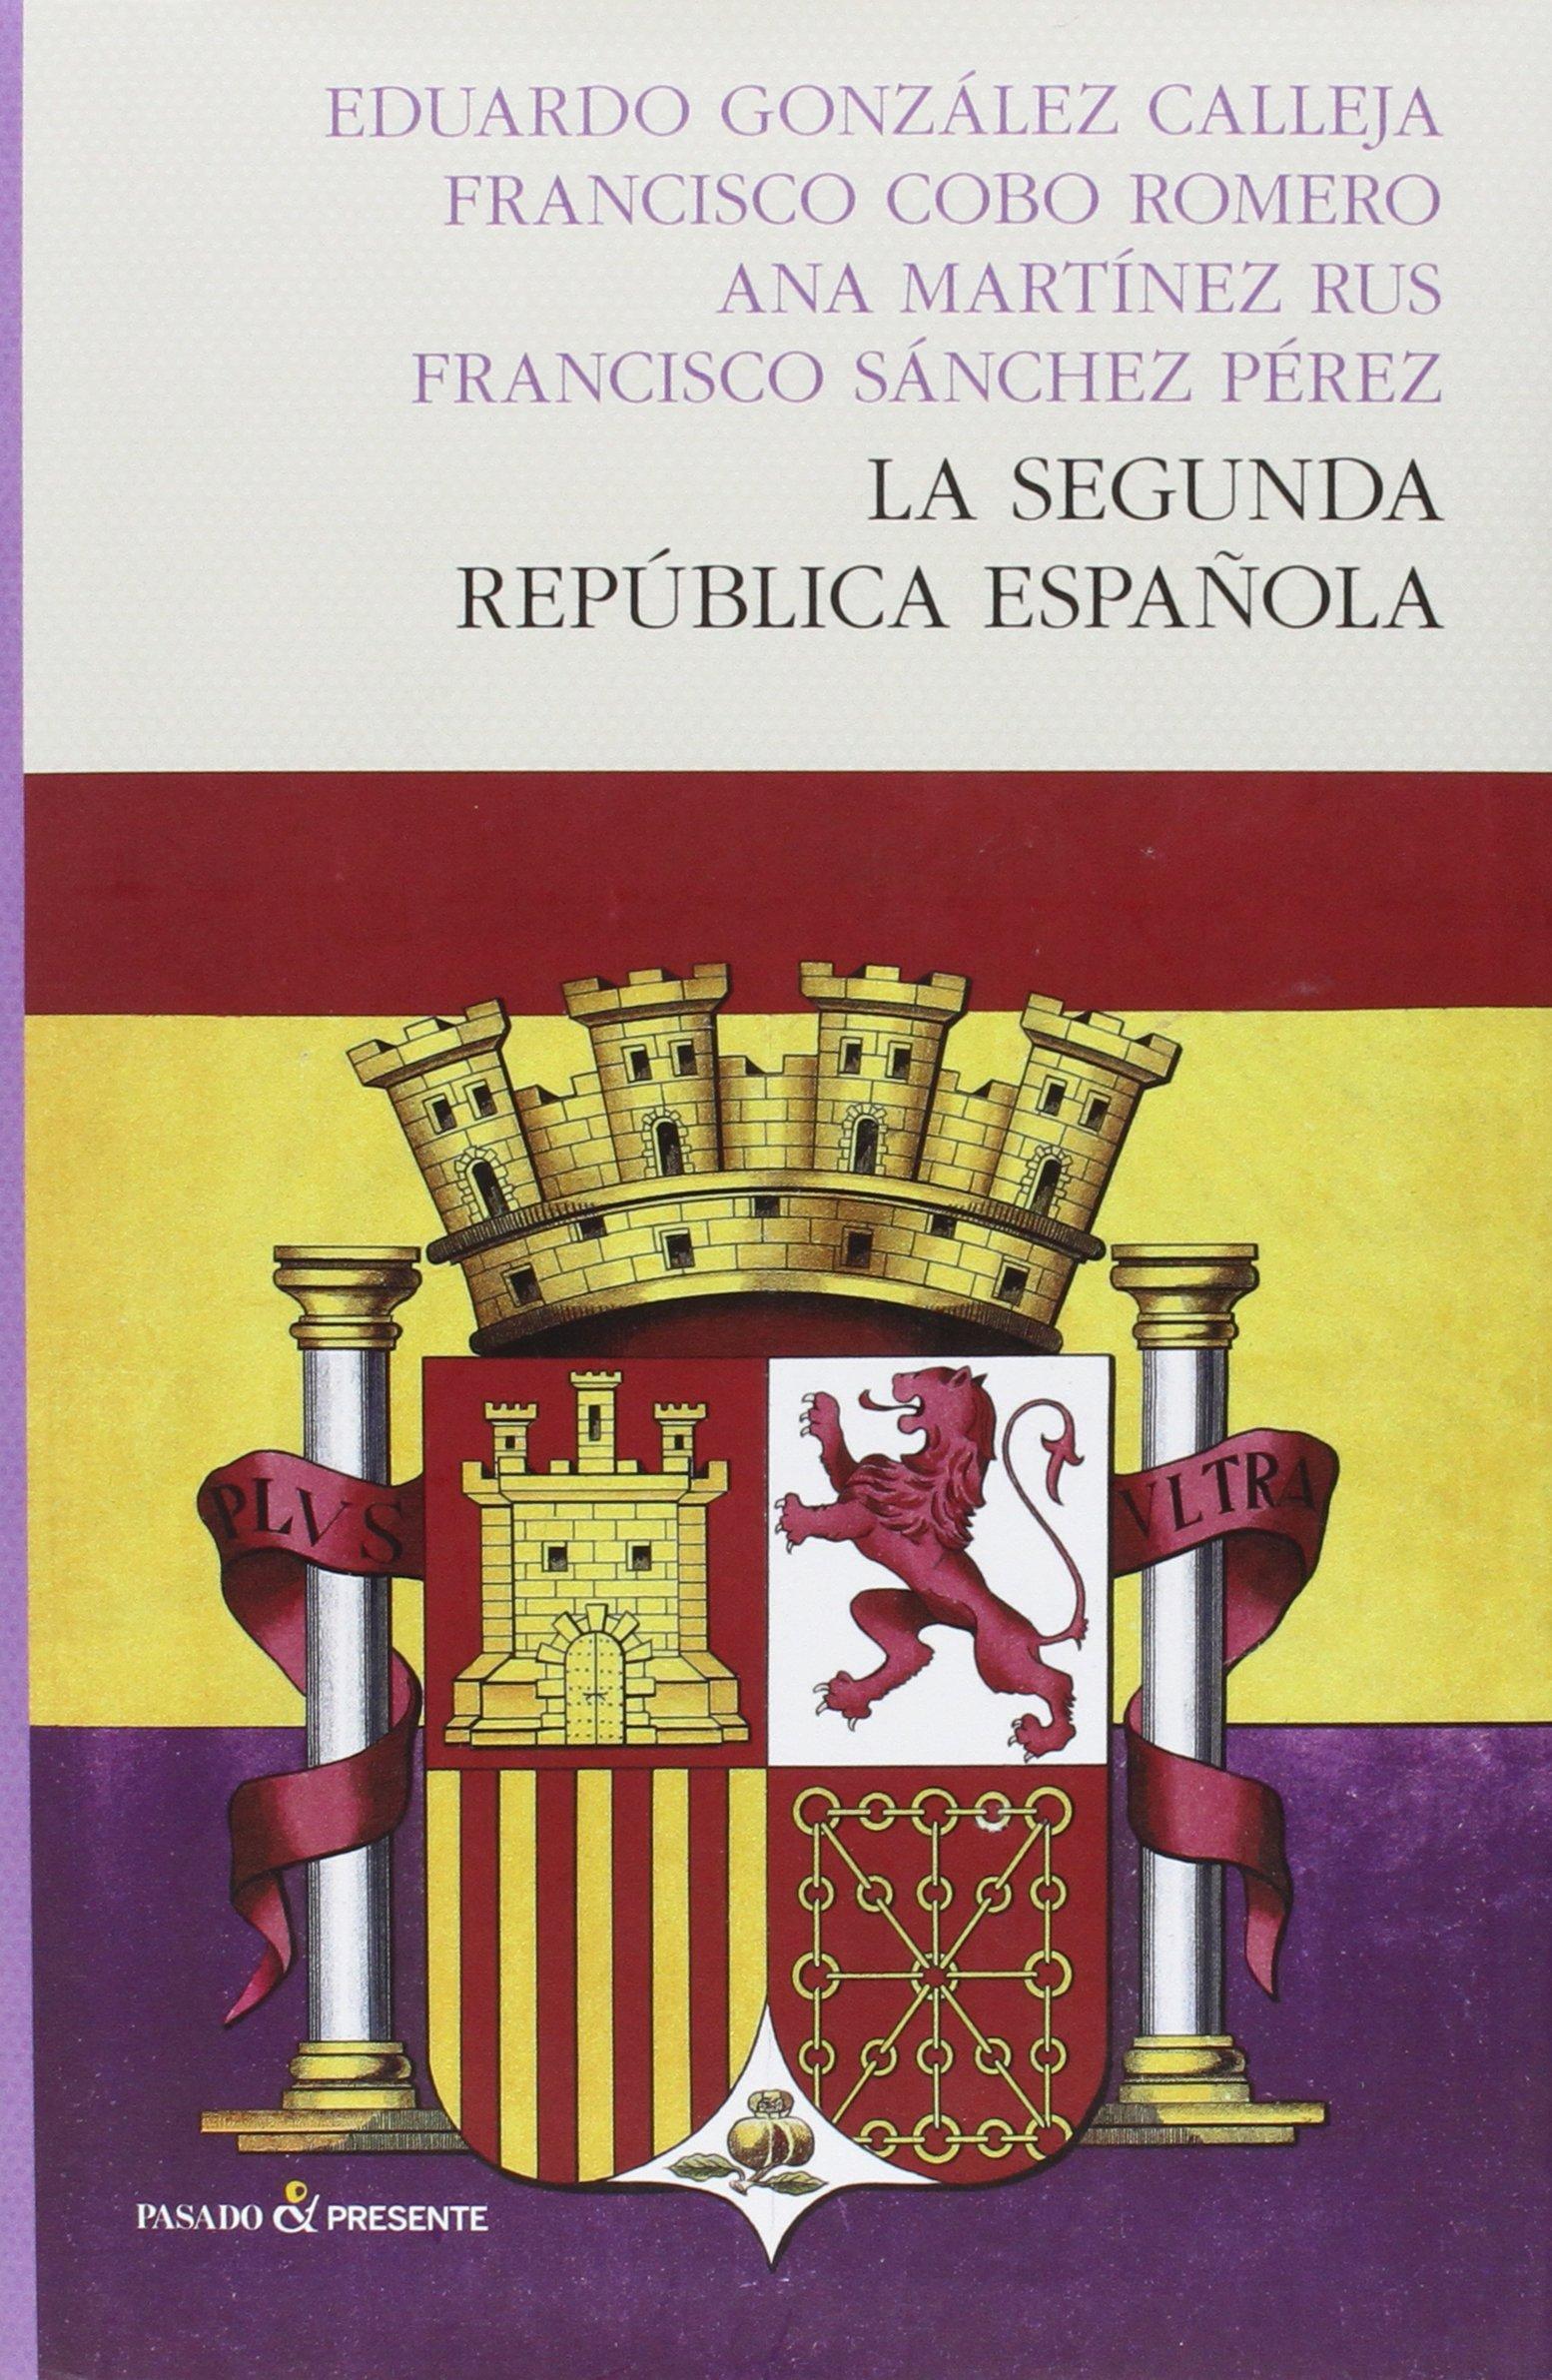 La segunda república española (HISTORIA): Amazon.es: González Calleja, Eduardo, Cobo Romero, Francisco, Martínez Rus, Ana, Sánchez Pérez, Francisco: Libros